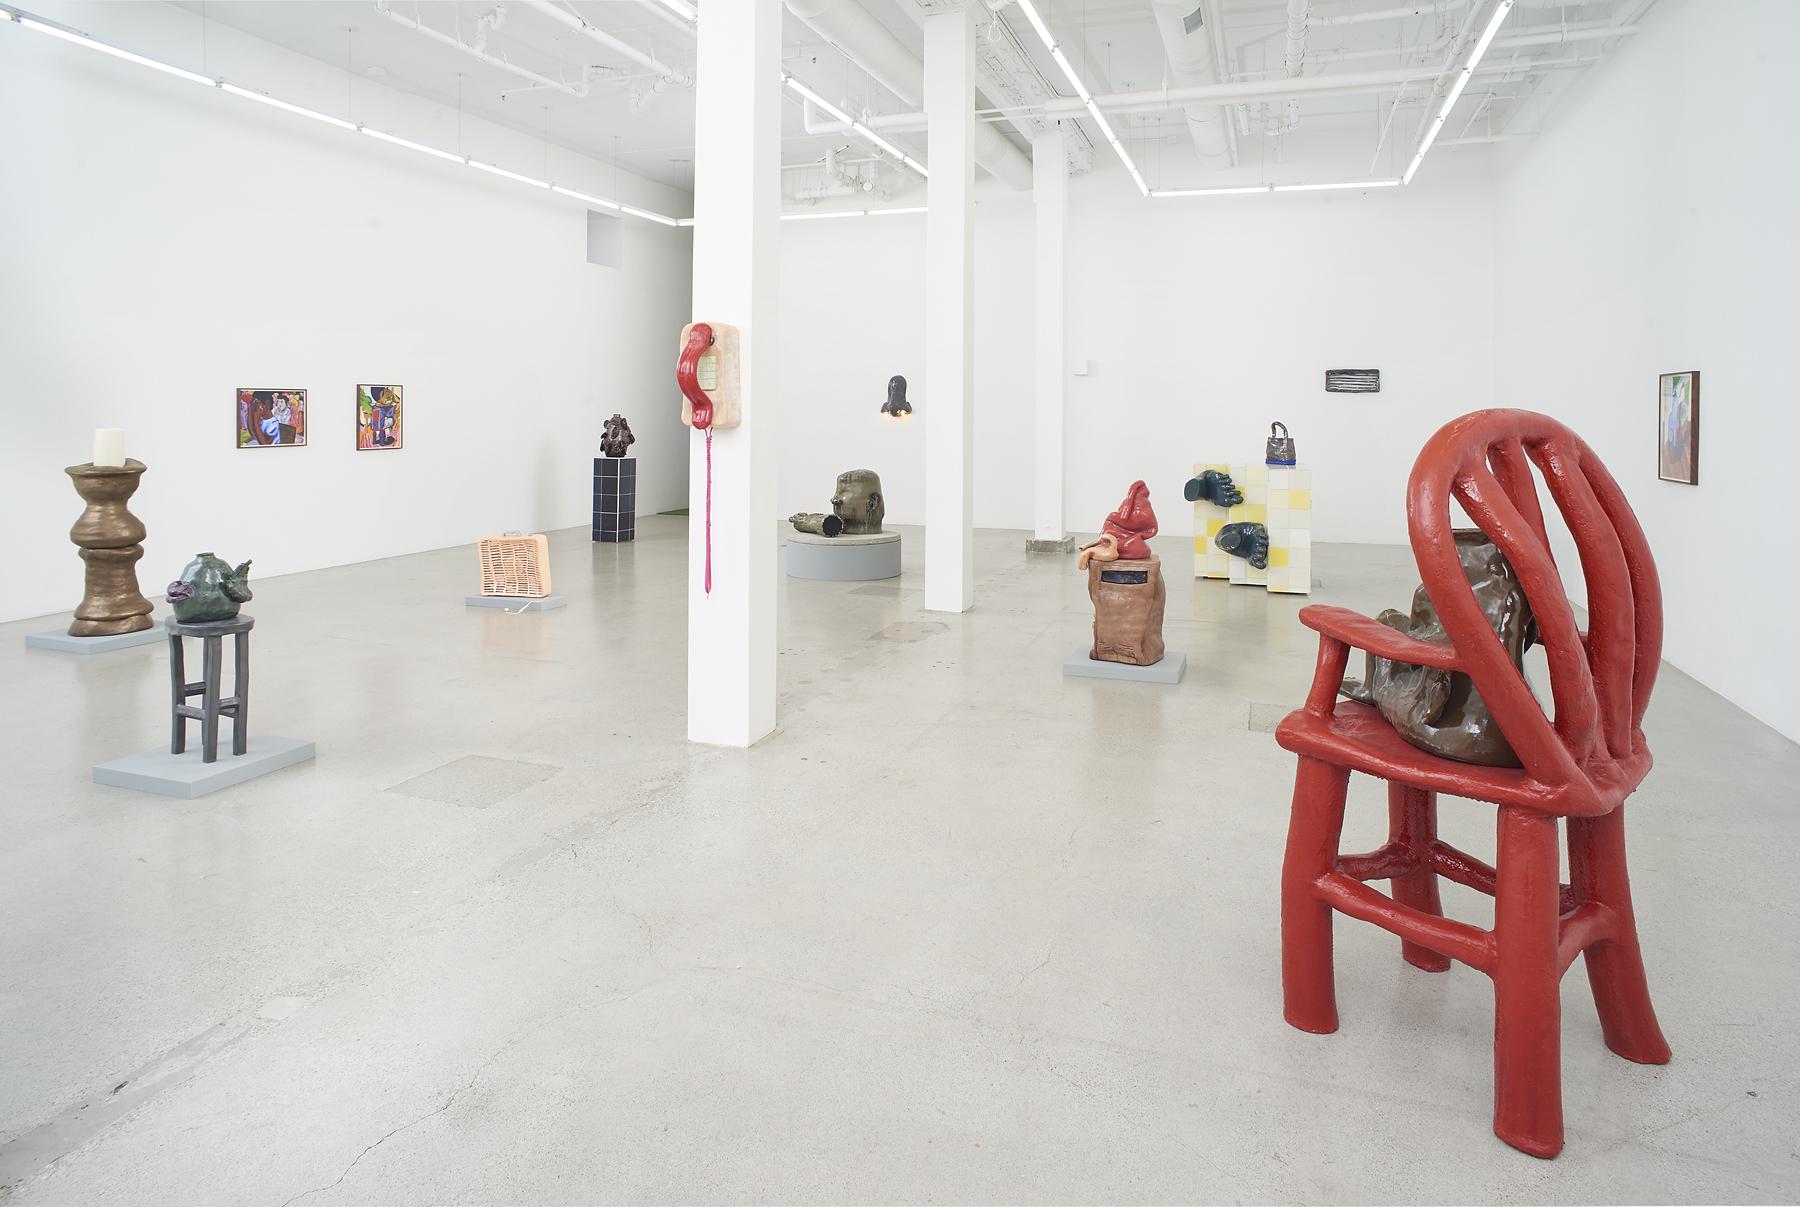 Othello_Living Room, 2018_Jessica Silverman Gallery_Installation view 16.PRS.jpg